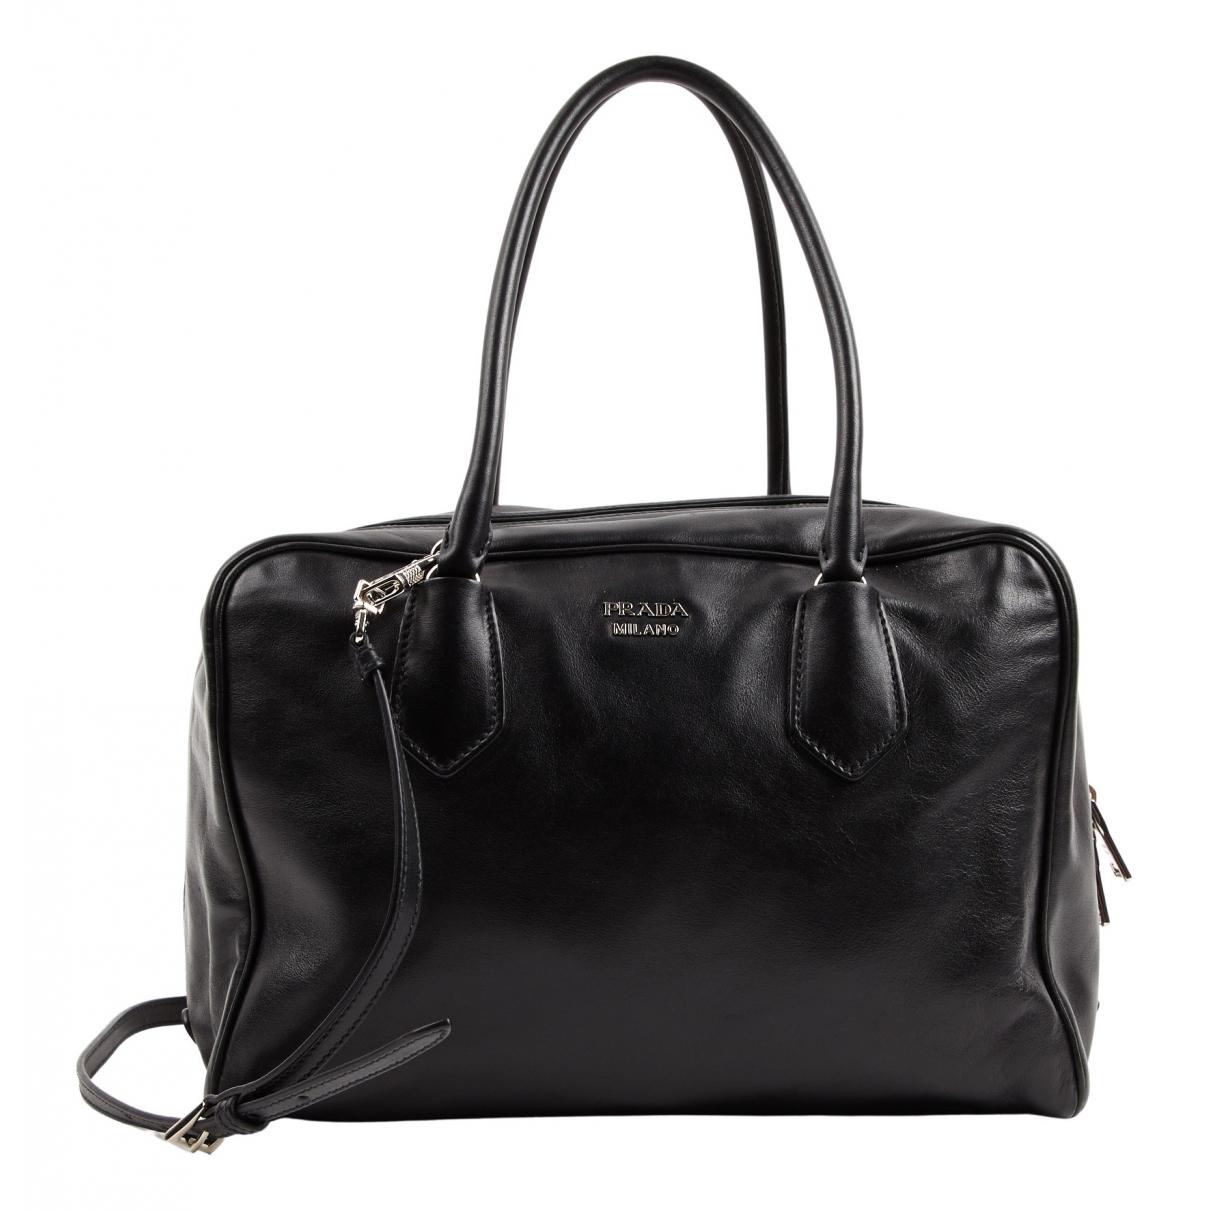 Prada \N Black Leather handbag for Women \N